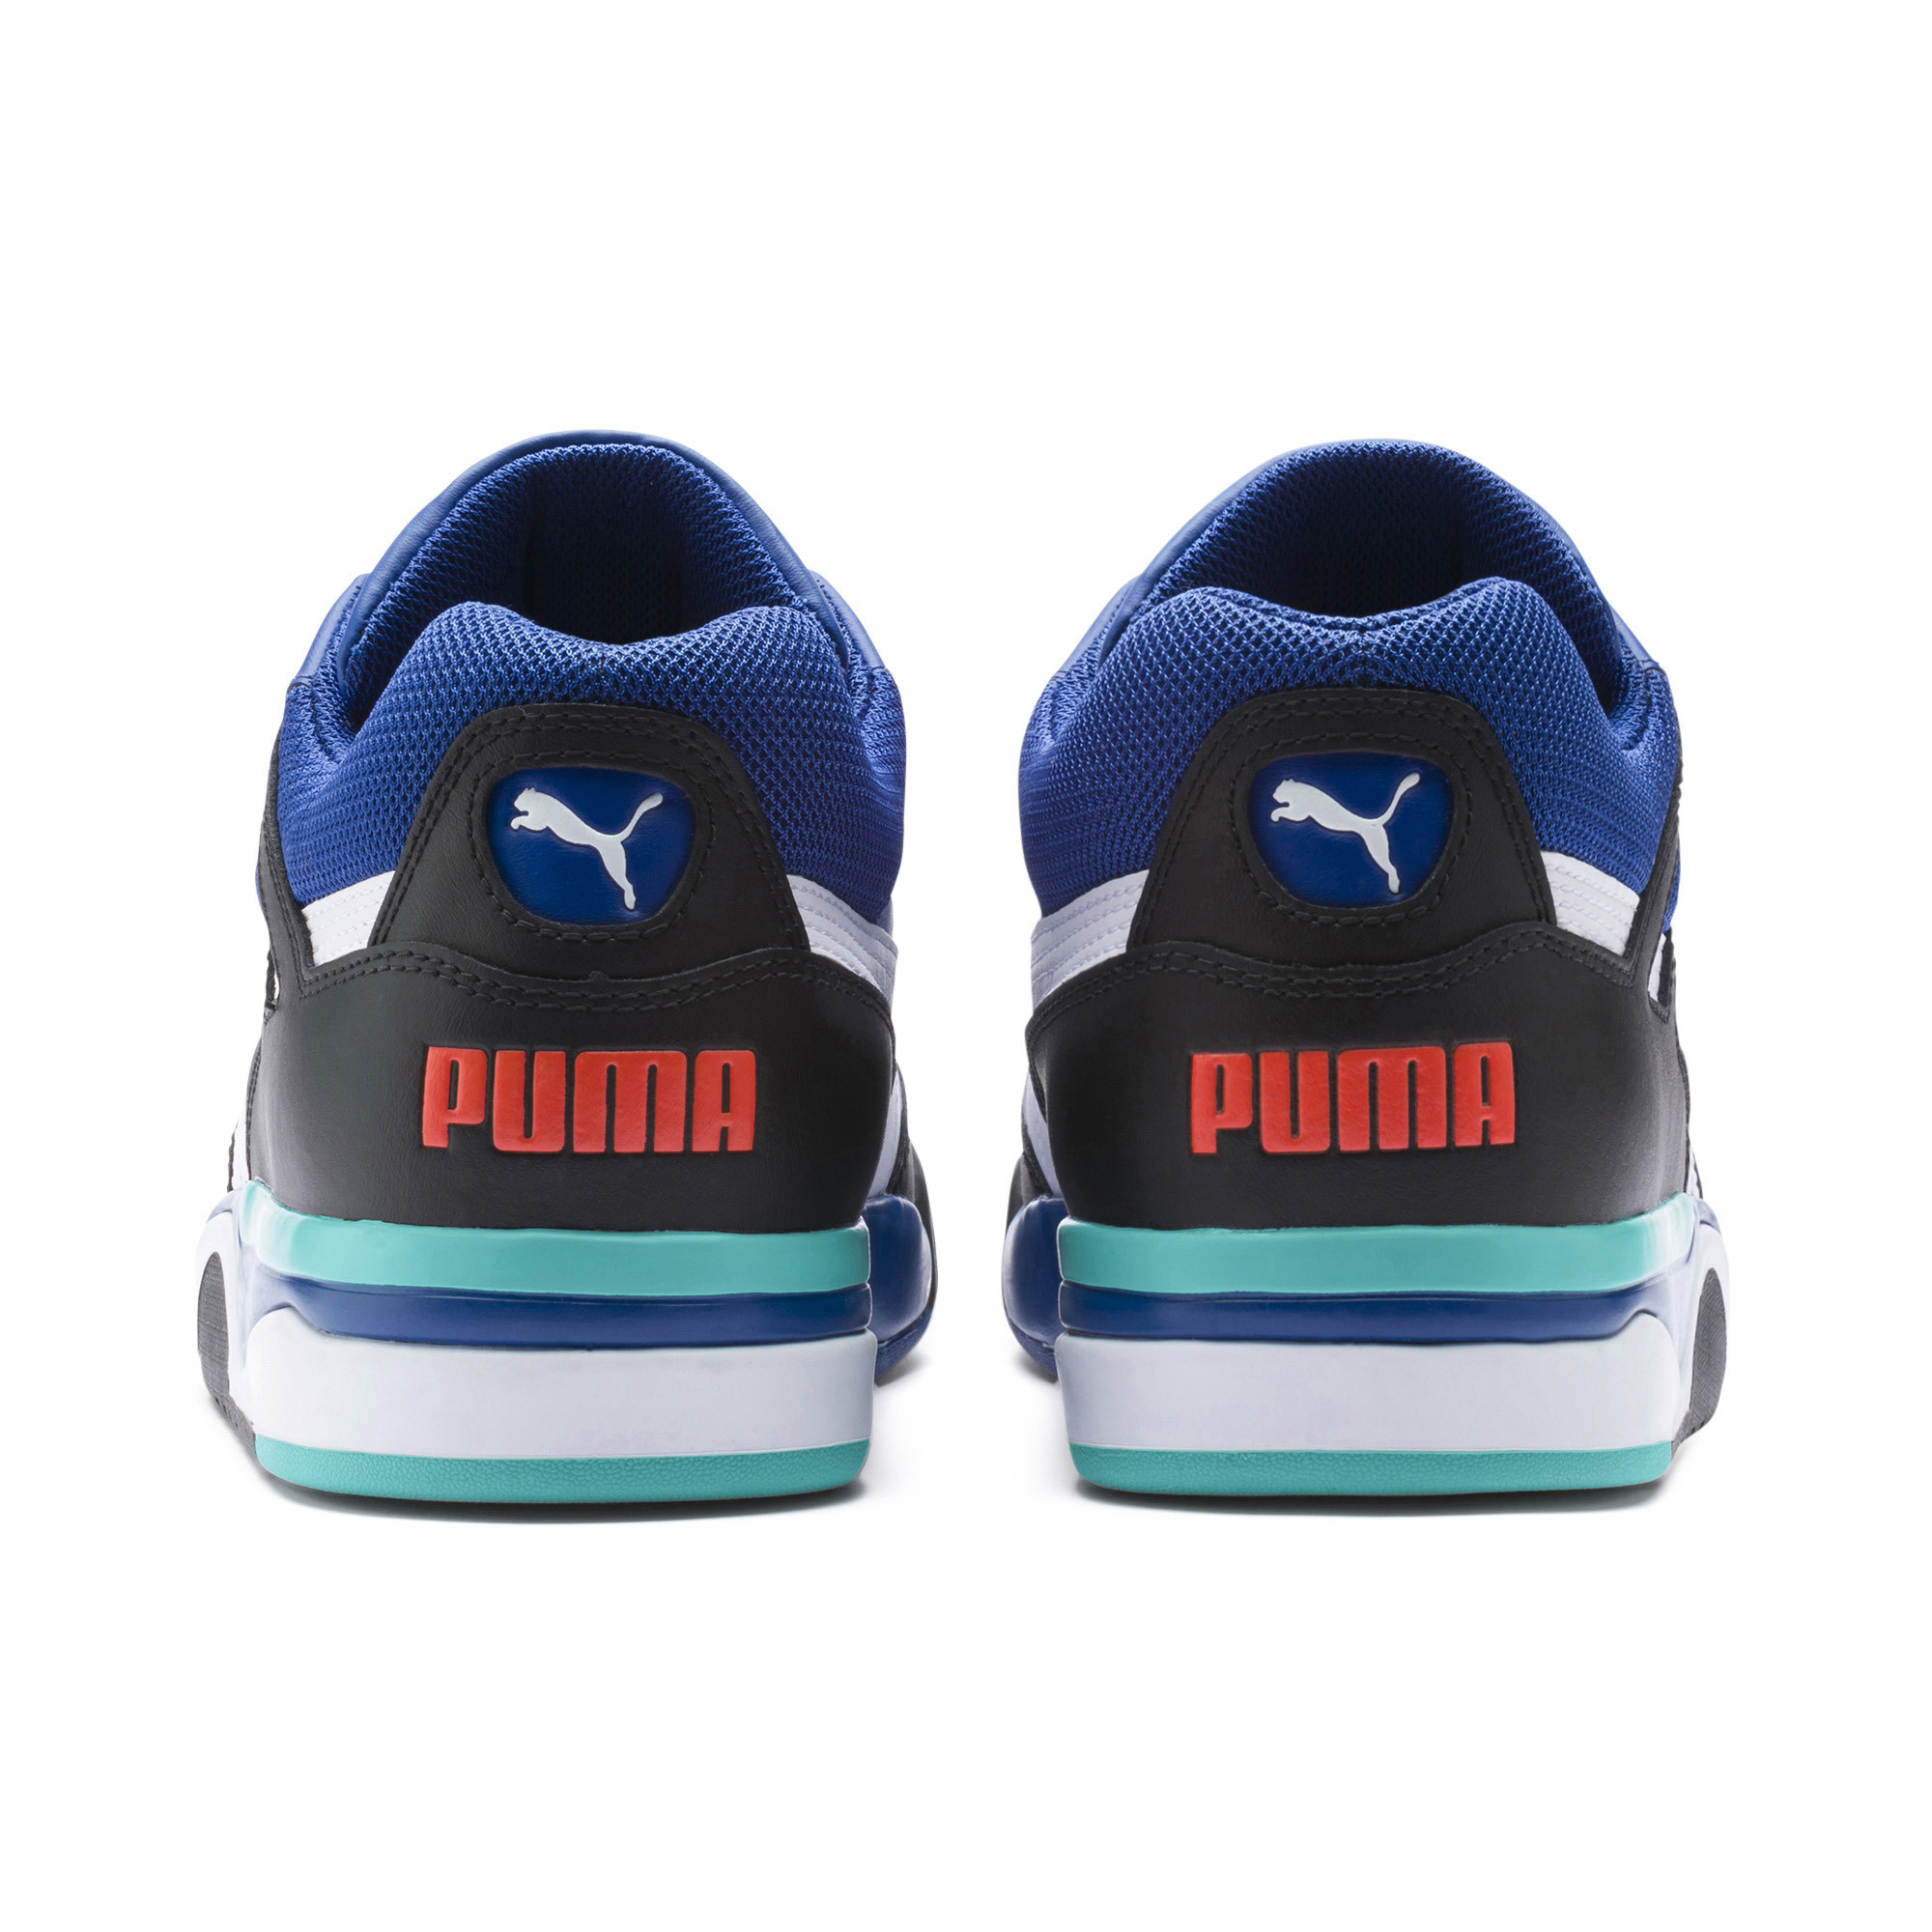 Indexbild 42 - PUMA Palace Guard Sneaker Unisex Schuhe Sport Classics Neu